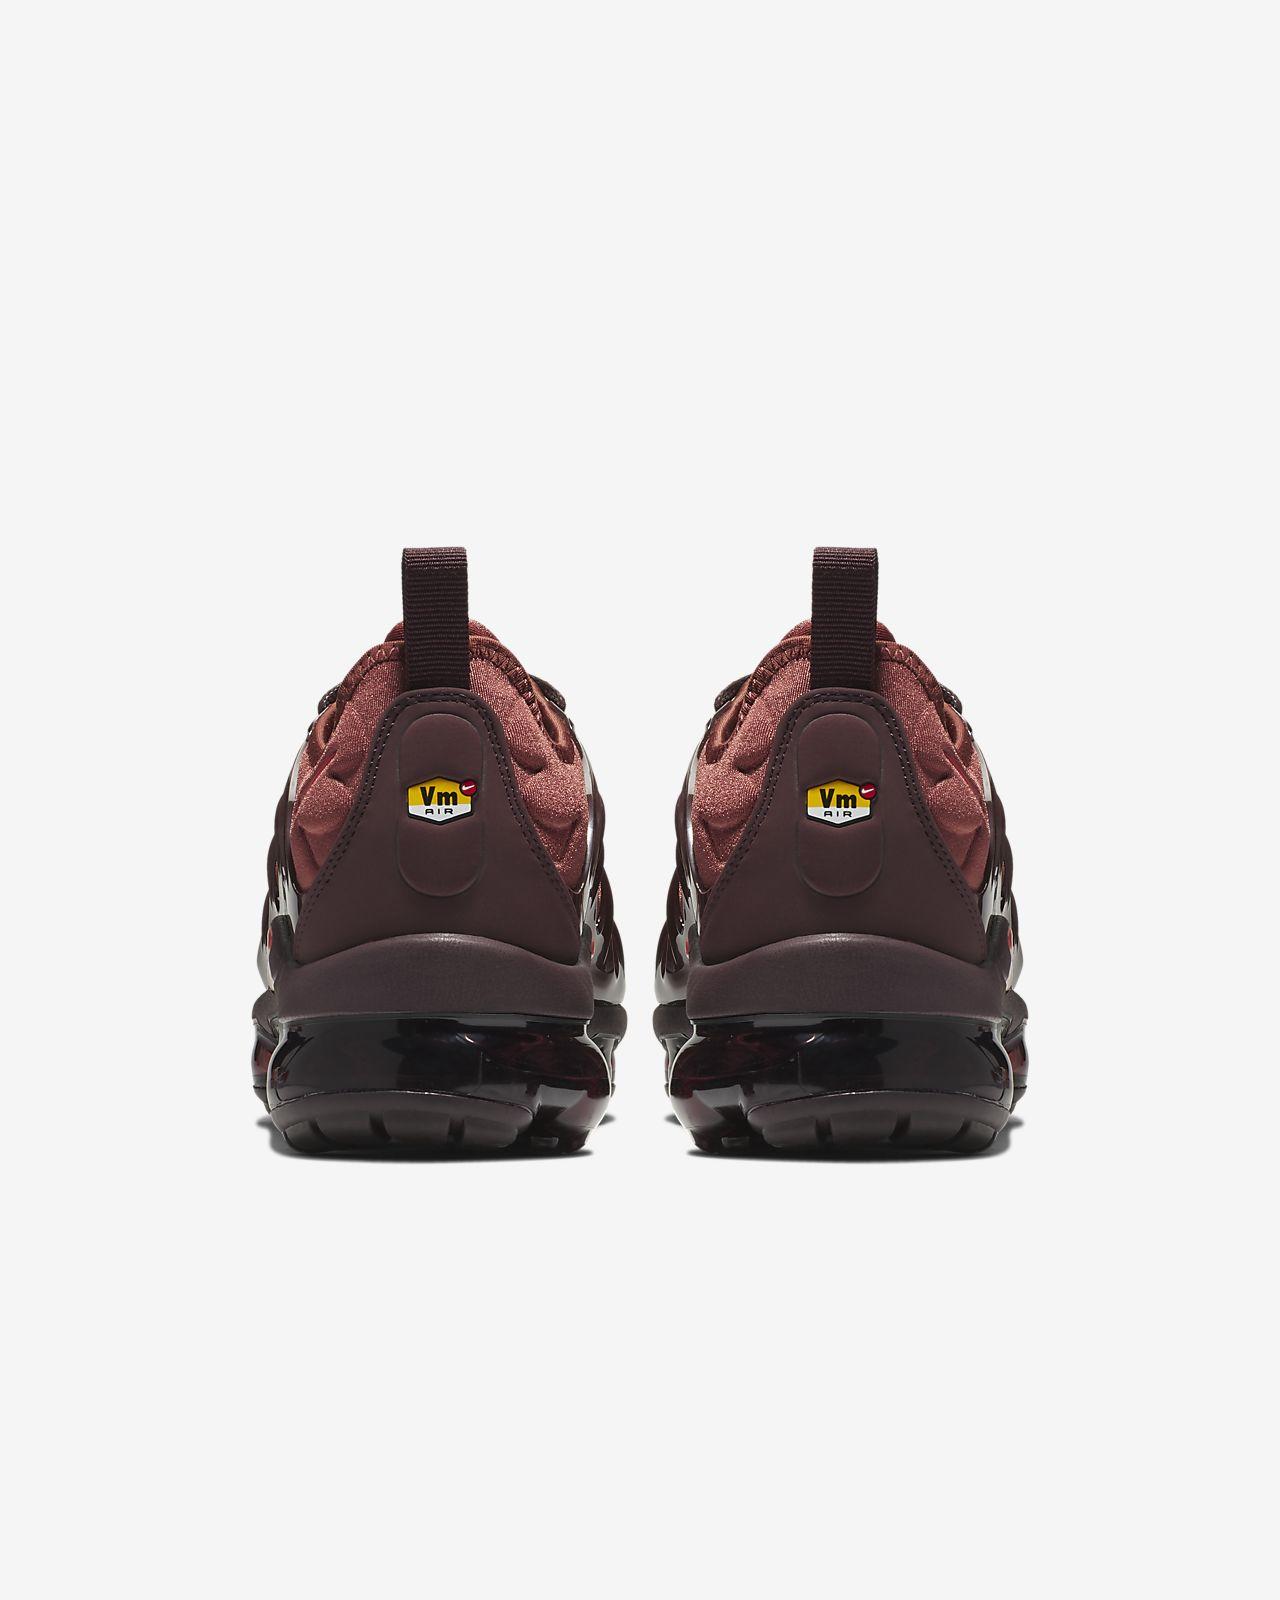 a7bab281cef6b Nike Air VaporMax Plus Women s Shoe. Nike.com PT